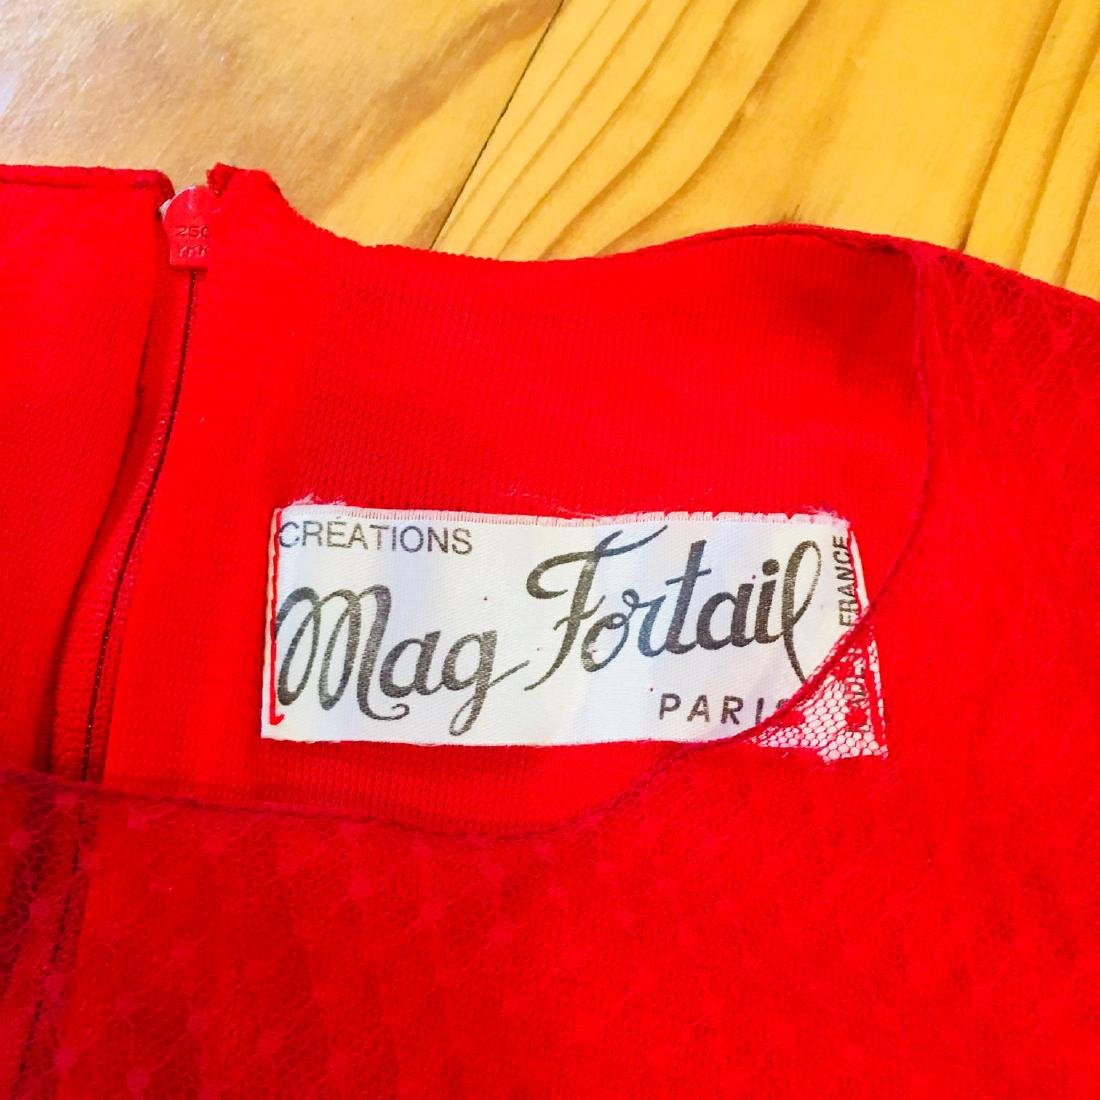 Women's Mag Fortail Designer Paris Cocktail Dress - 6